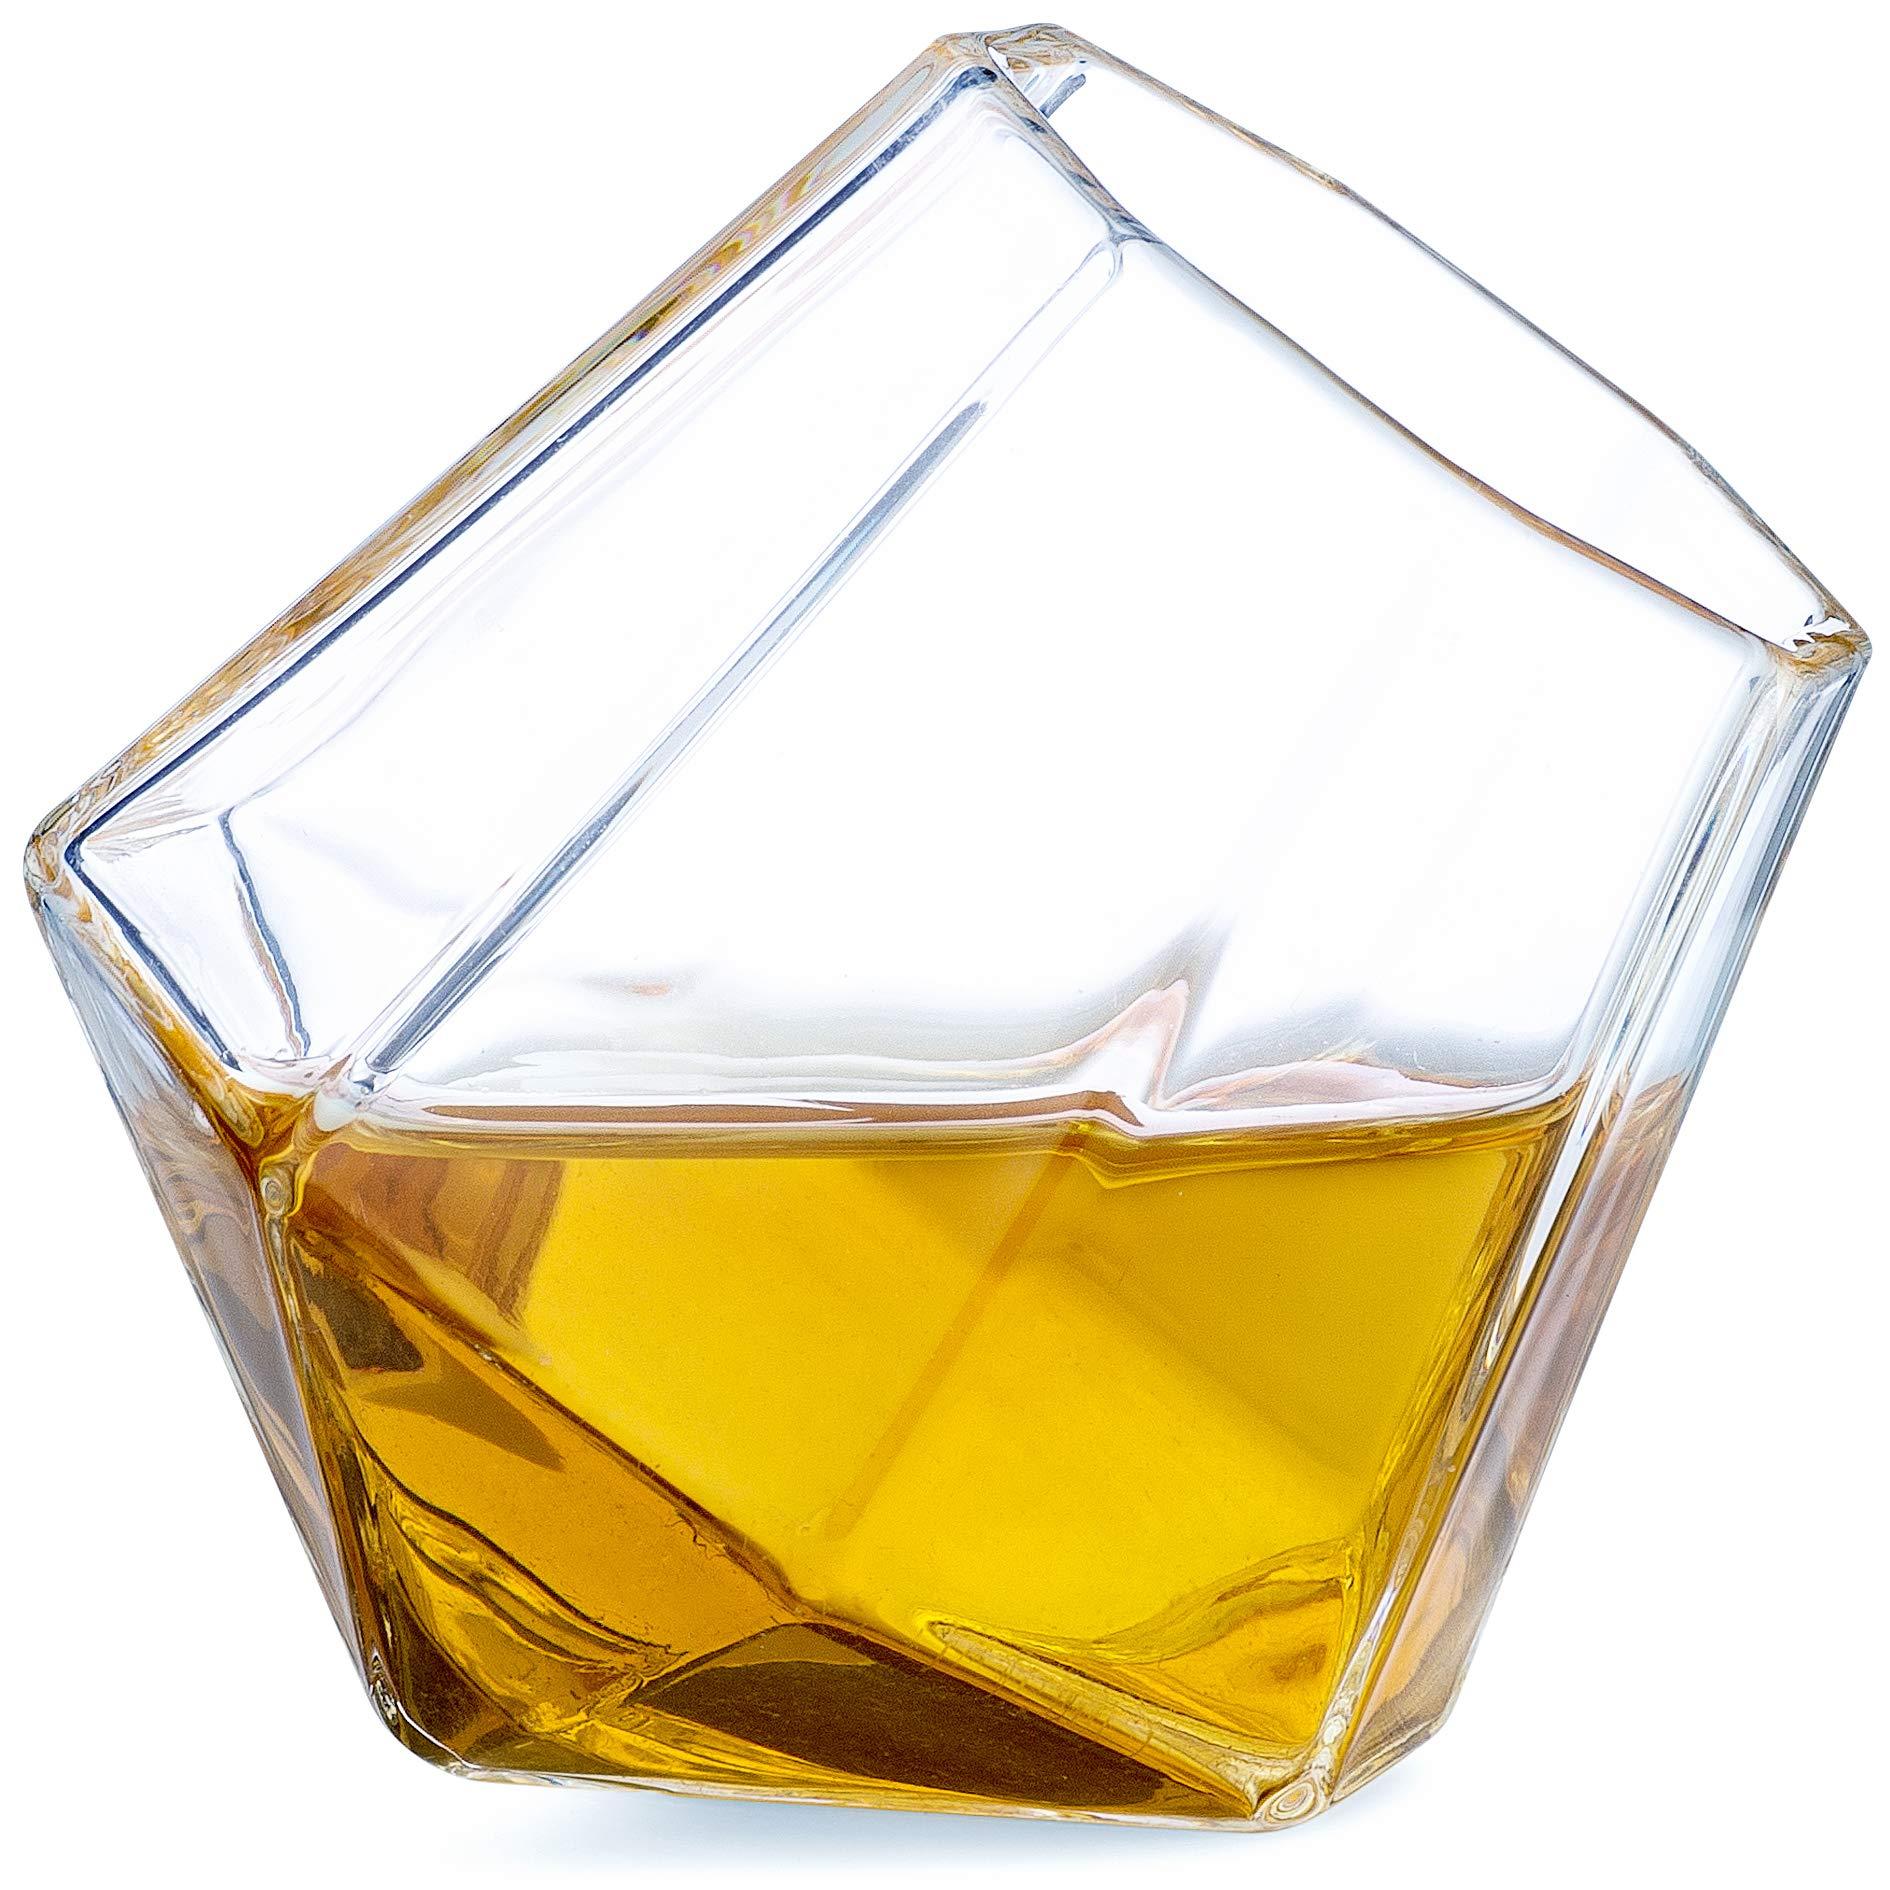 Dragon Glassware Diamond Shot Glasses, Premium Designer Cups for Liquor and Spirits, 1.7-Ounces, Gift Boxed - Set of 4